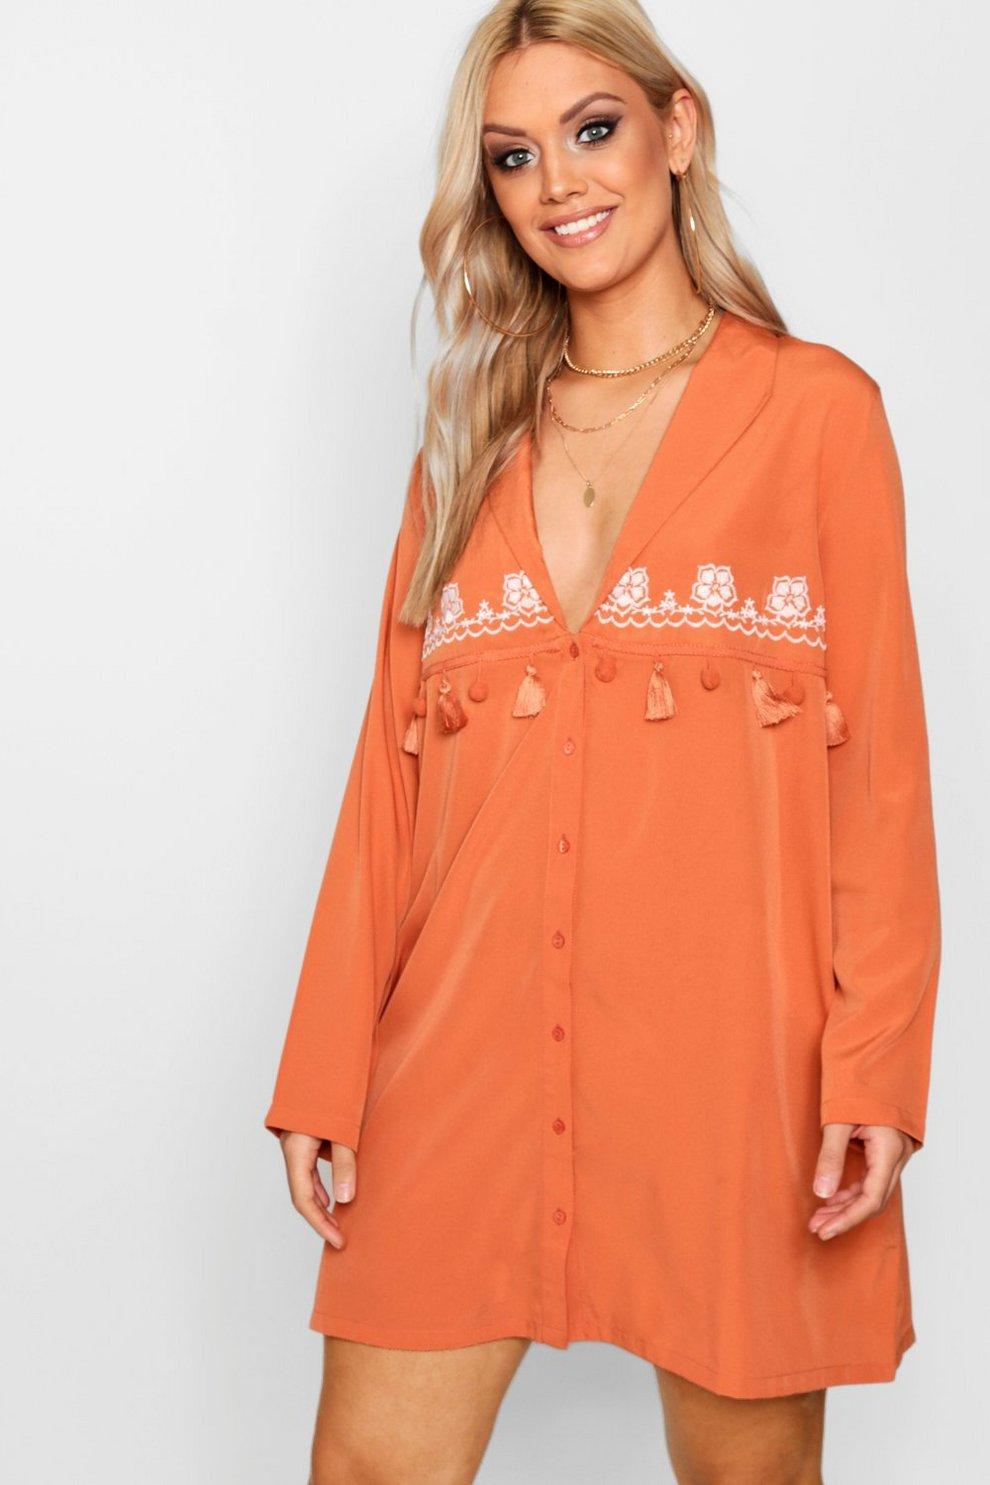 Boohoo Embroidered Tassel Shirt Cheap Sale Sale 100% Guaranteed Sale Online Store Sale Online eCsUlDkq